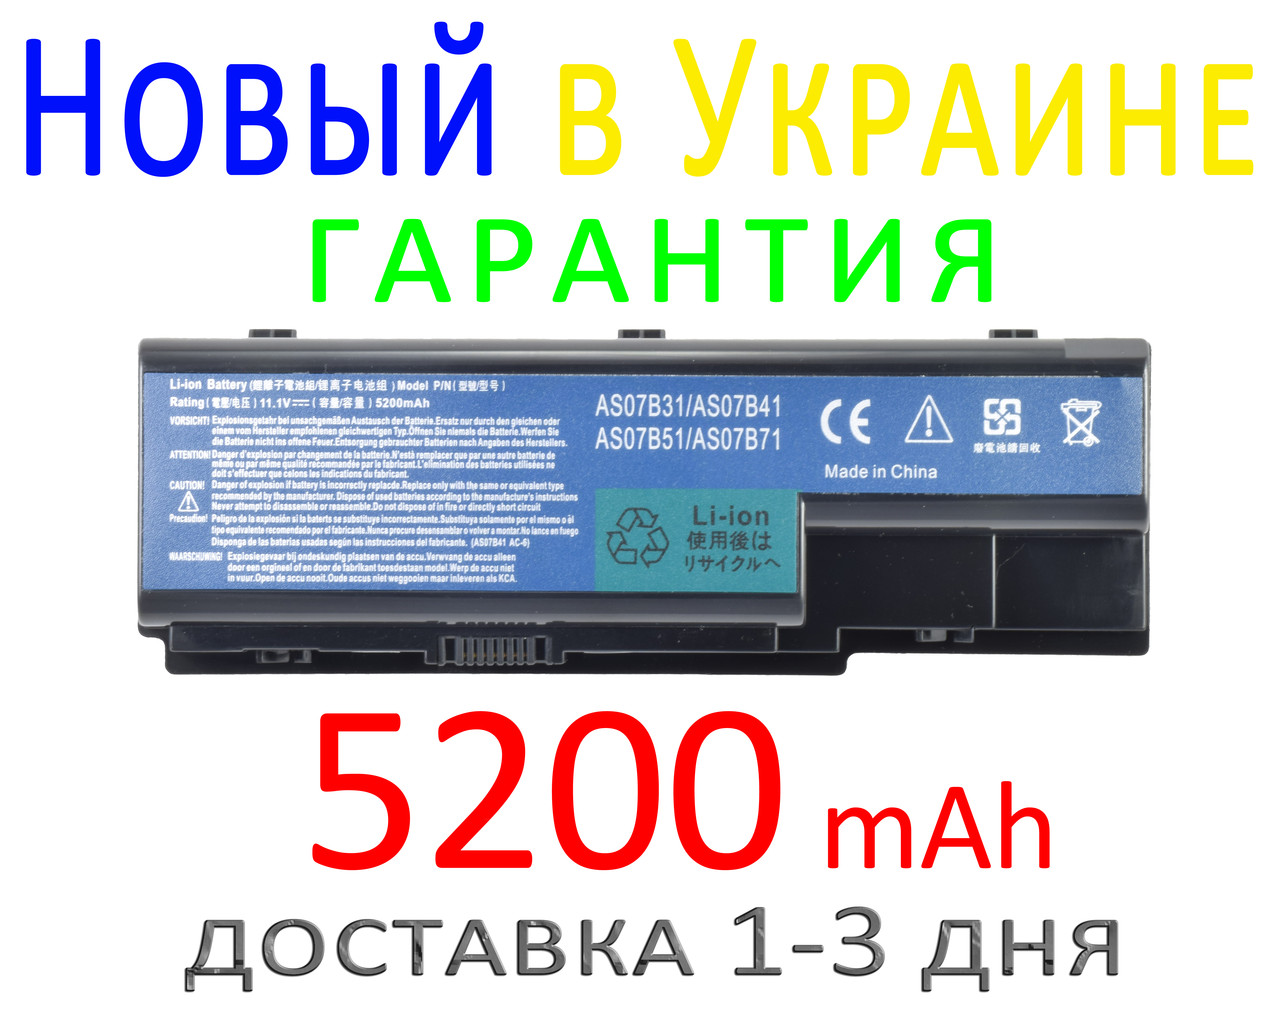 Аккумулятор батарея ACER Aspire 5220 8942 Extensa 7230 7630G TravelMate 7230 7730G GATEWAY MD7801u